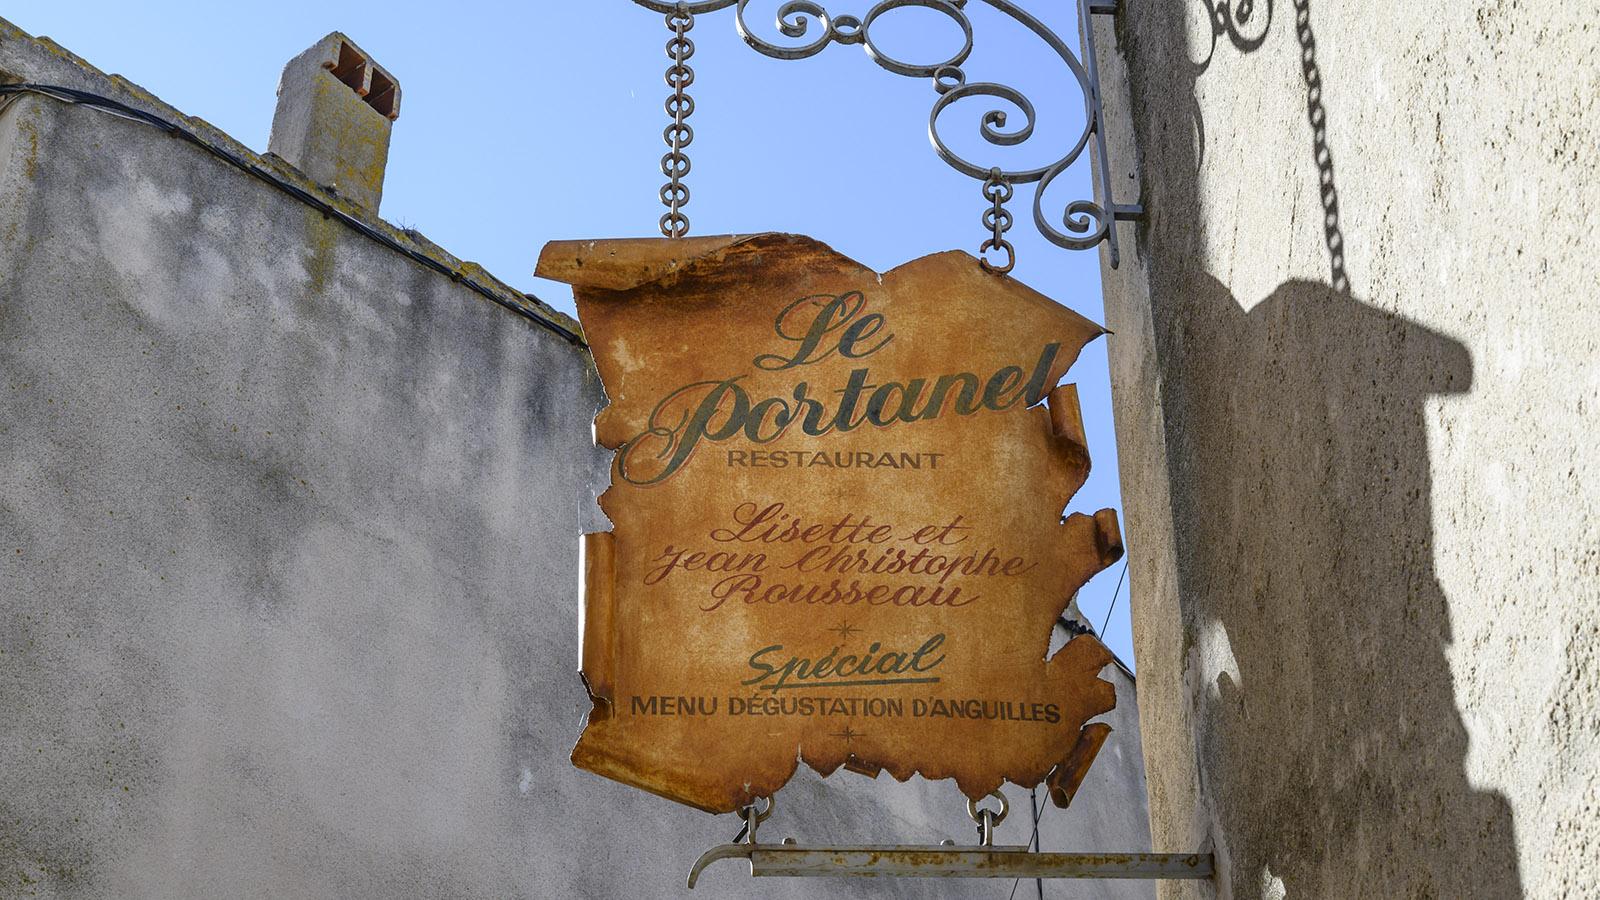 Bages: Aale: Sie prägend auch die Küche im Le Portanel. Foto: Hilke Maunder